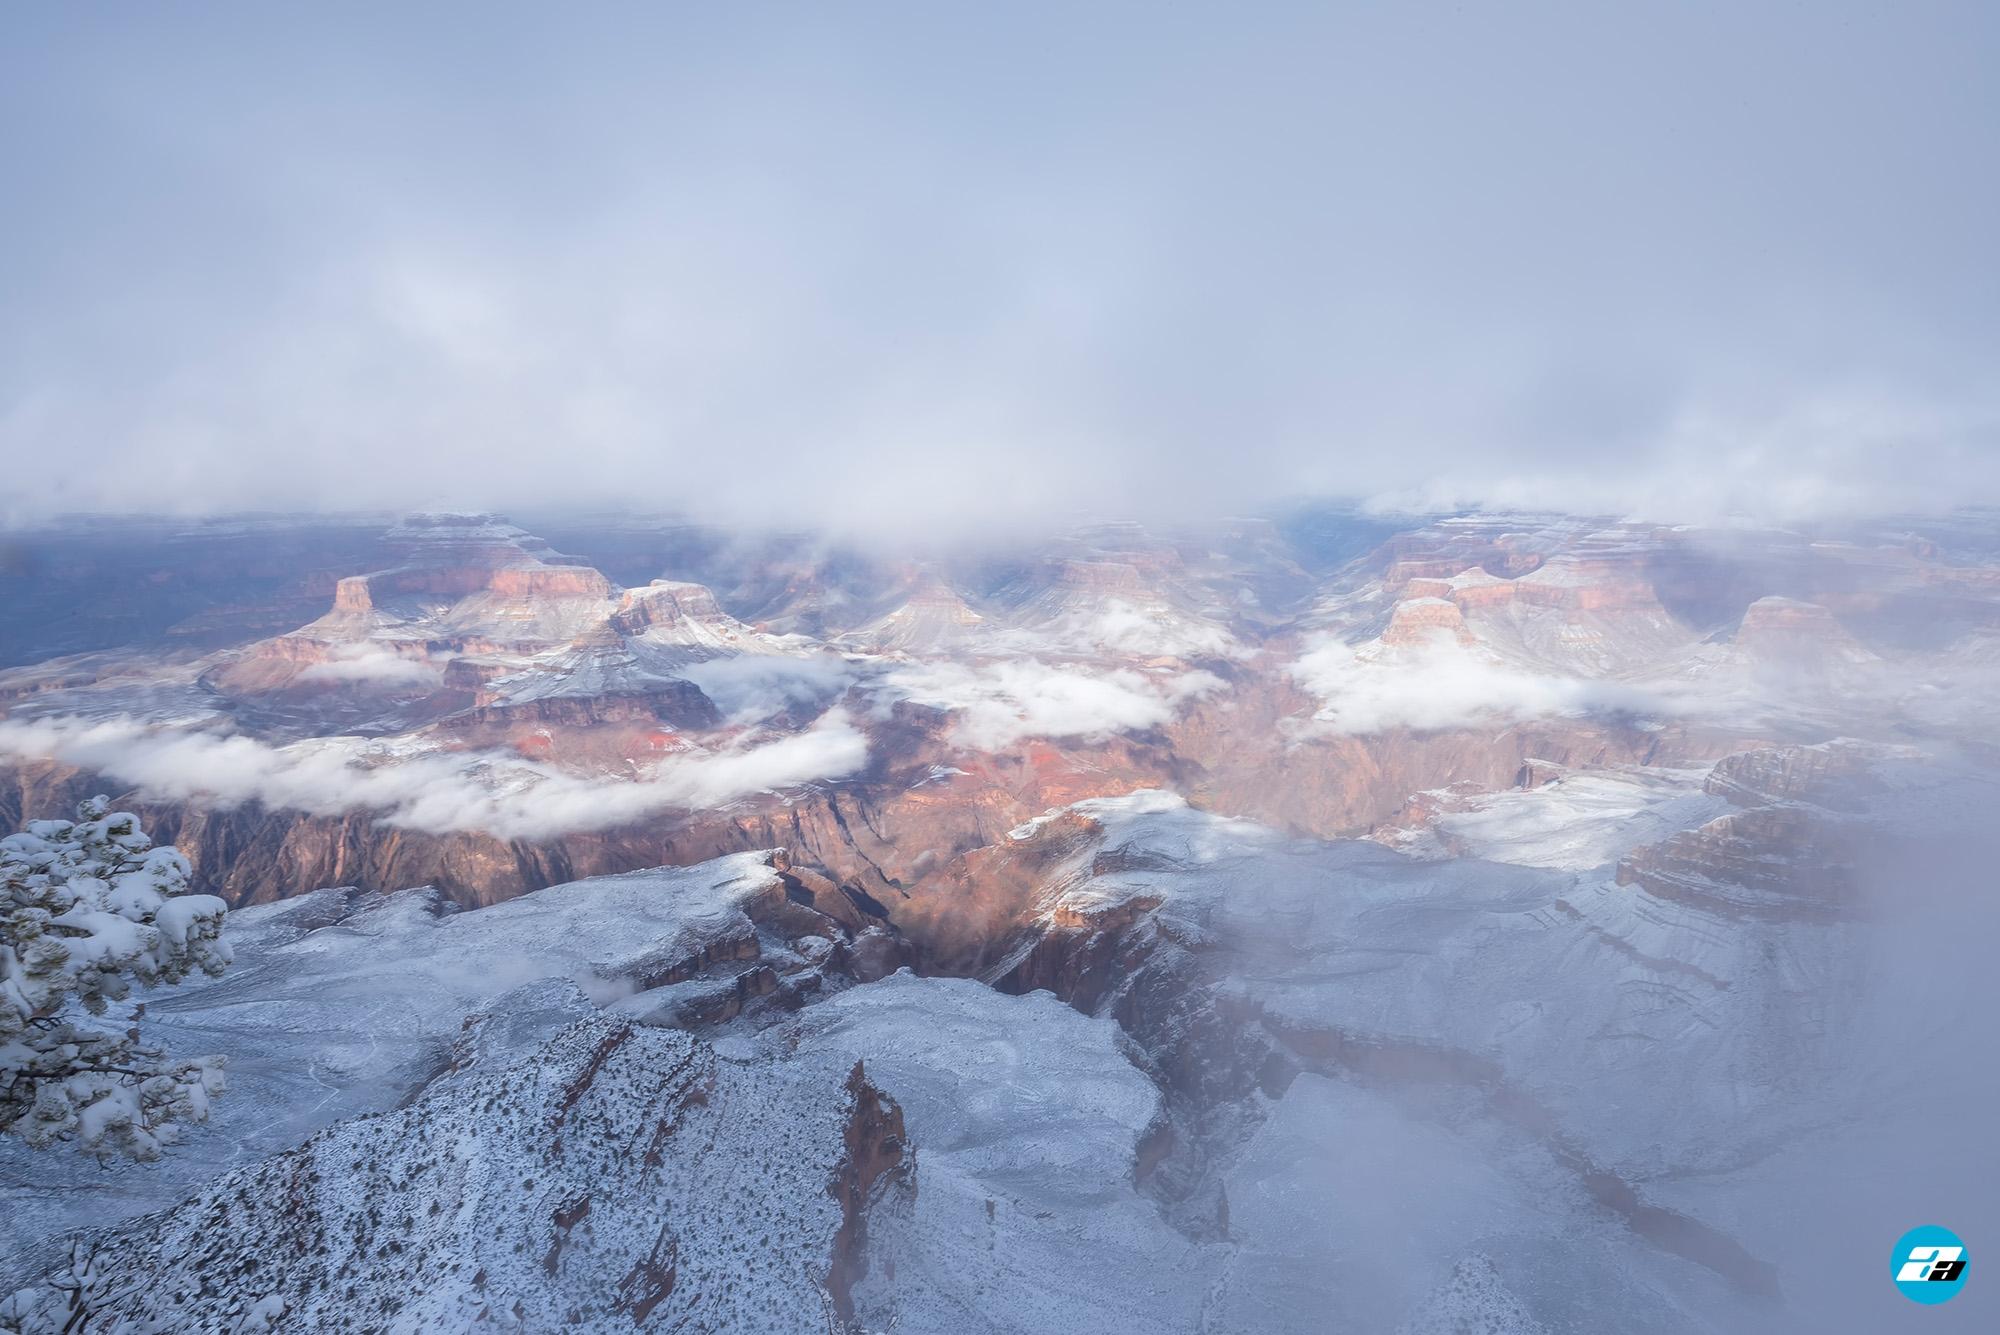 Arizona, USA. Canyon View. Explorer. Winter Season. Arizona Attraction & Travel. Canyon Snow.